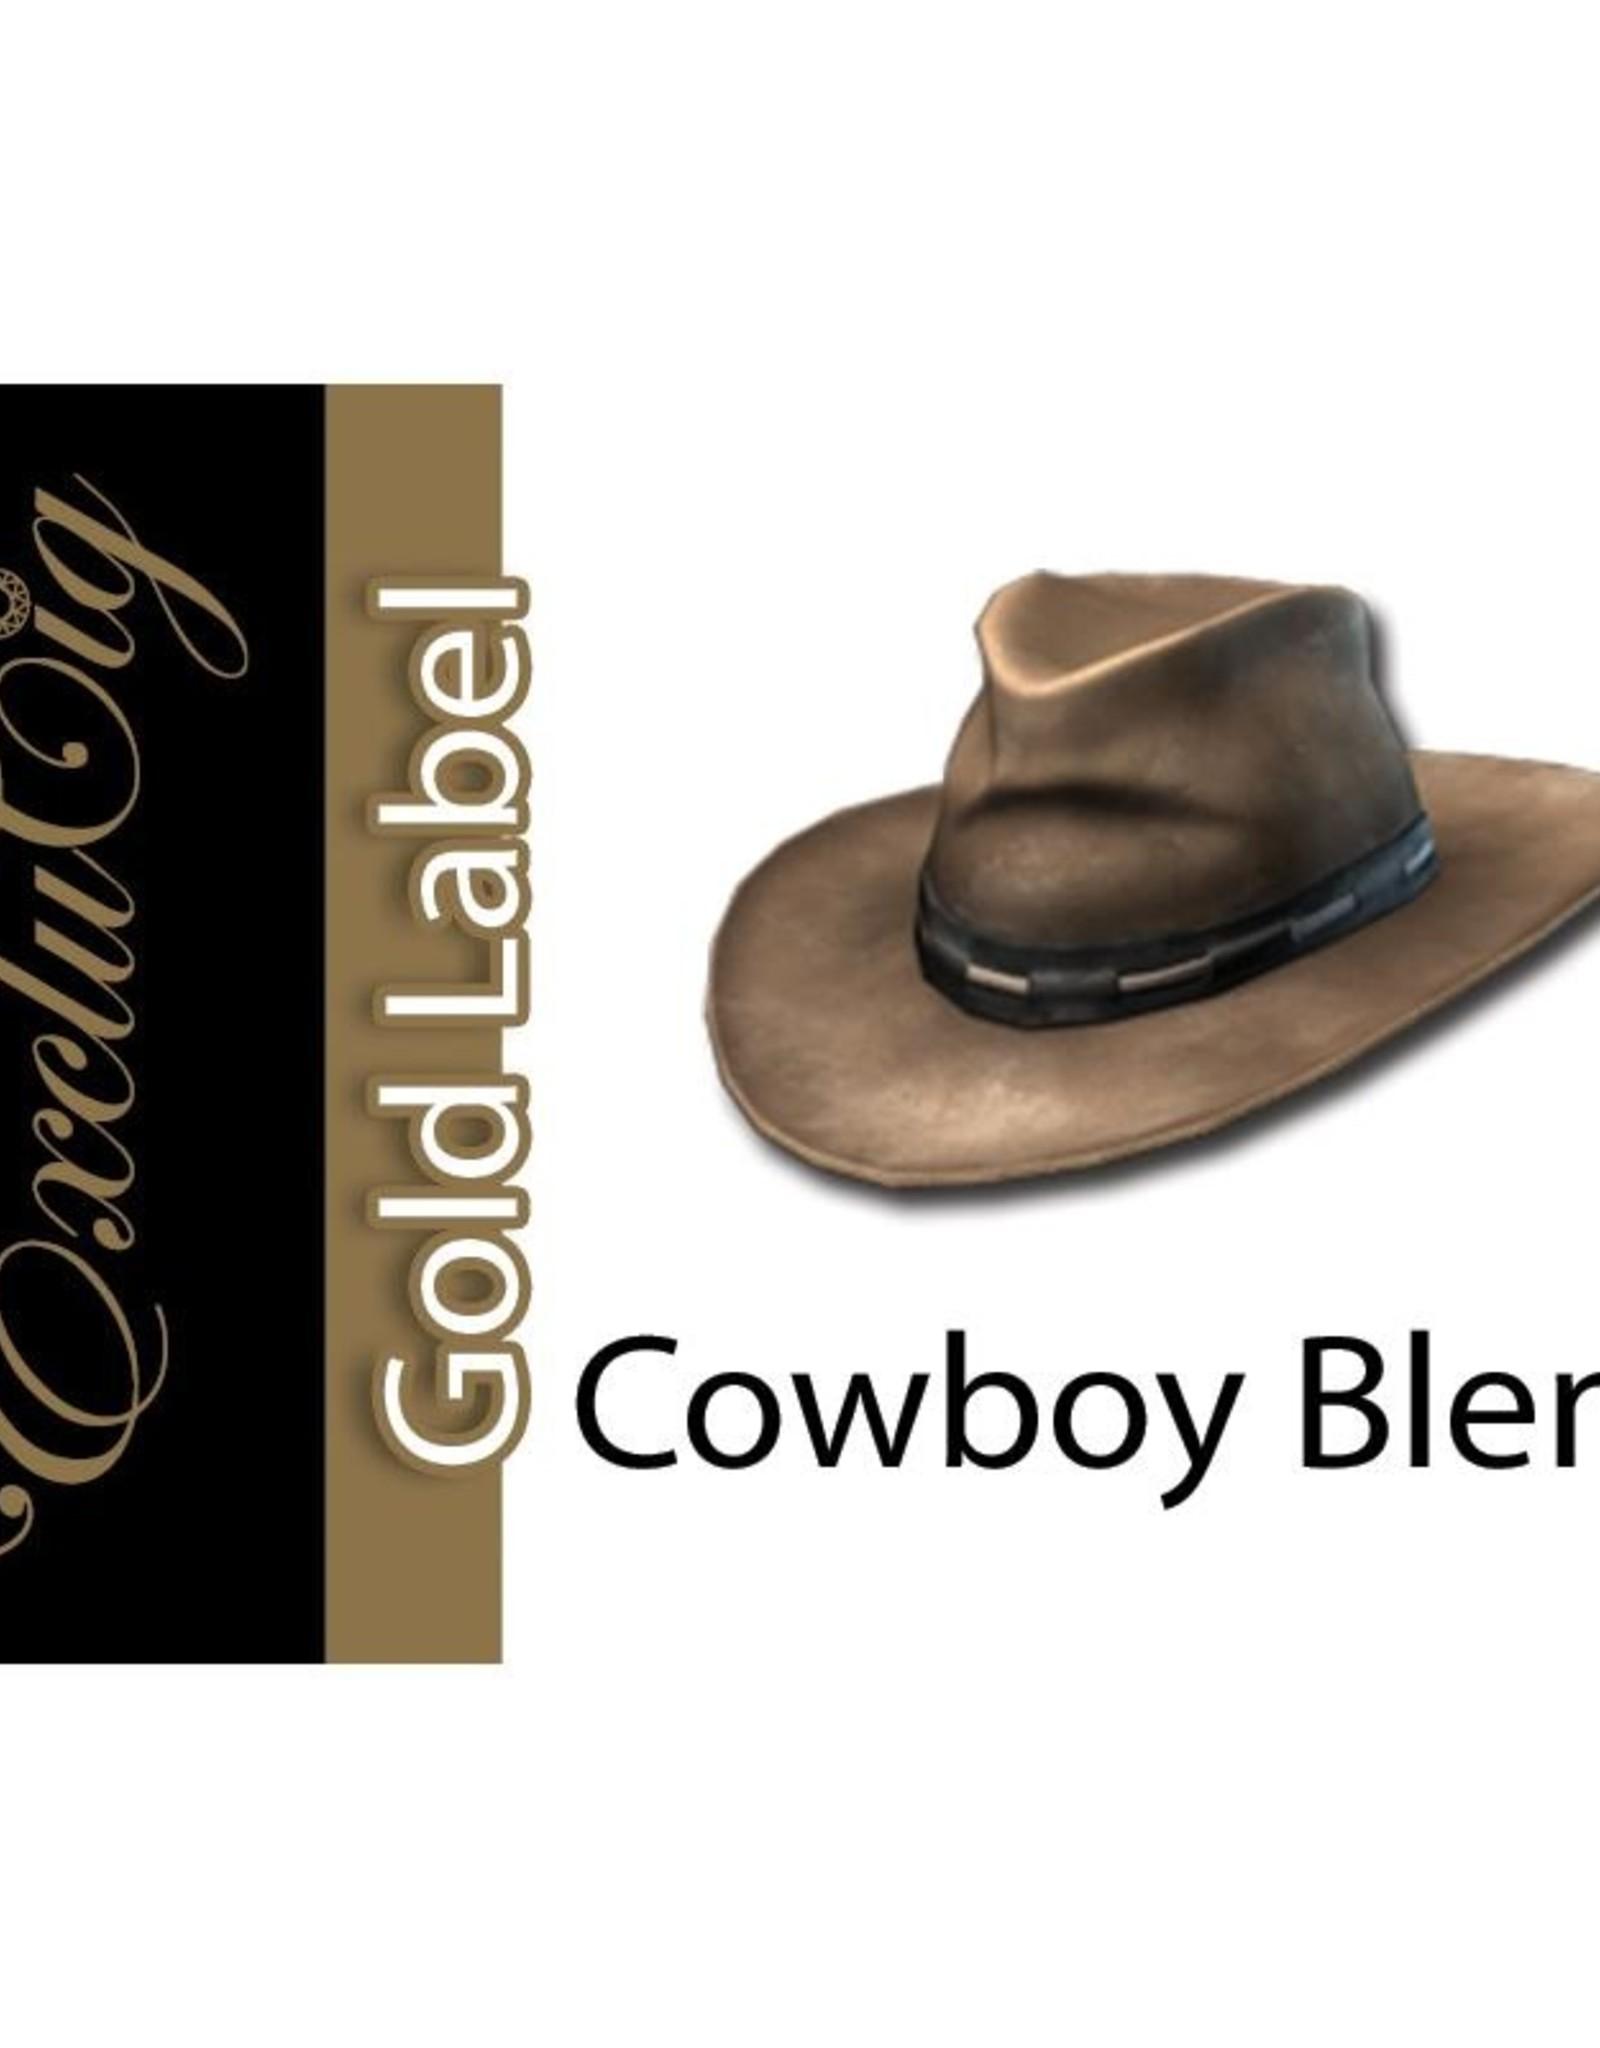 Exclucig Exclucig Gold Label E-liquid Cowboy Blend 12 mg Nicotine